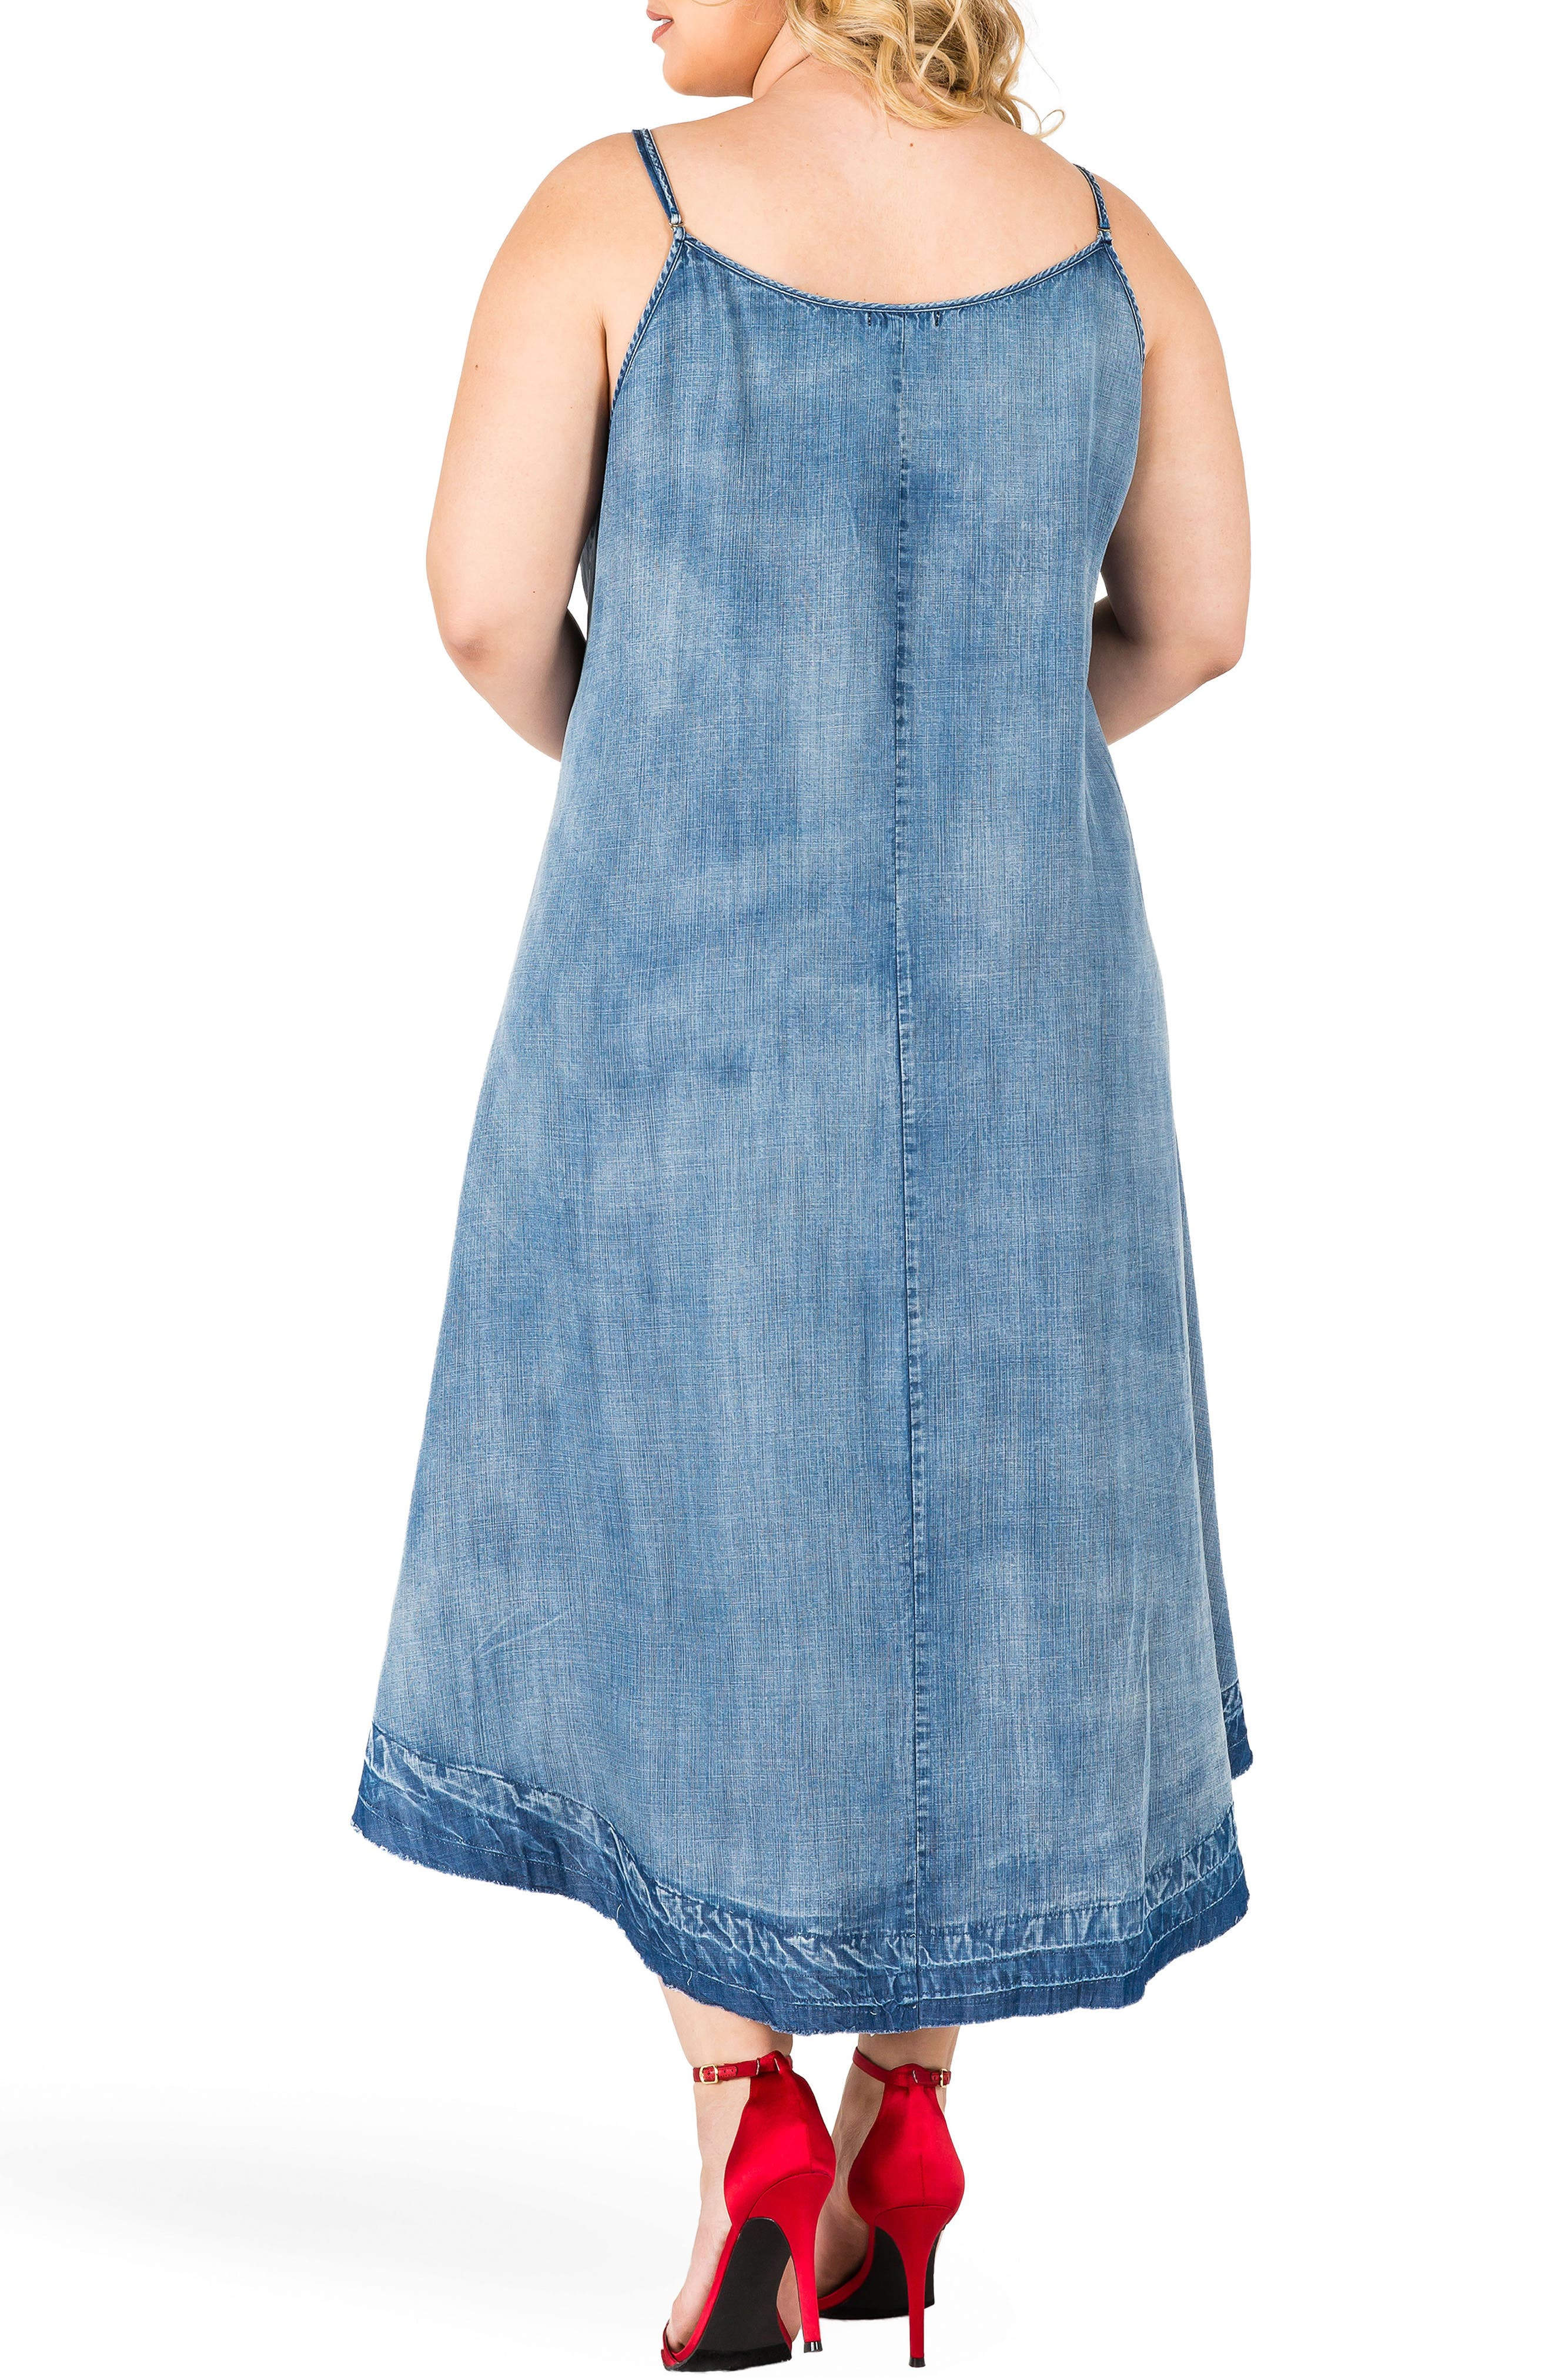 STANDARDS & PRACTICES,                             Taylor Tank Denim Midi Dress,                             Alternate thumbnail 2, color,                             MEDIUM BLUE